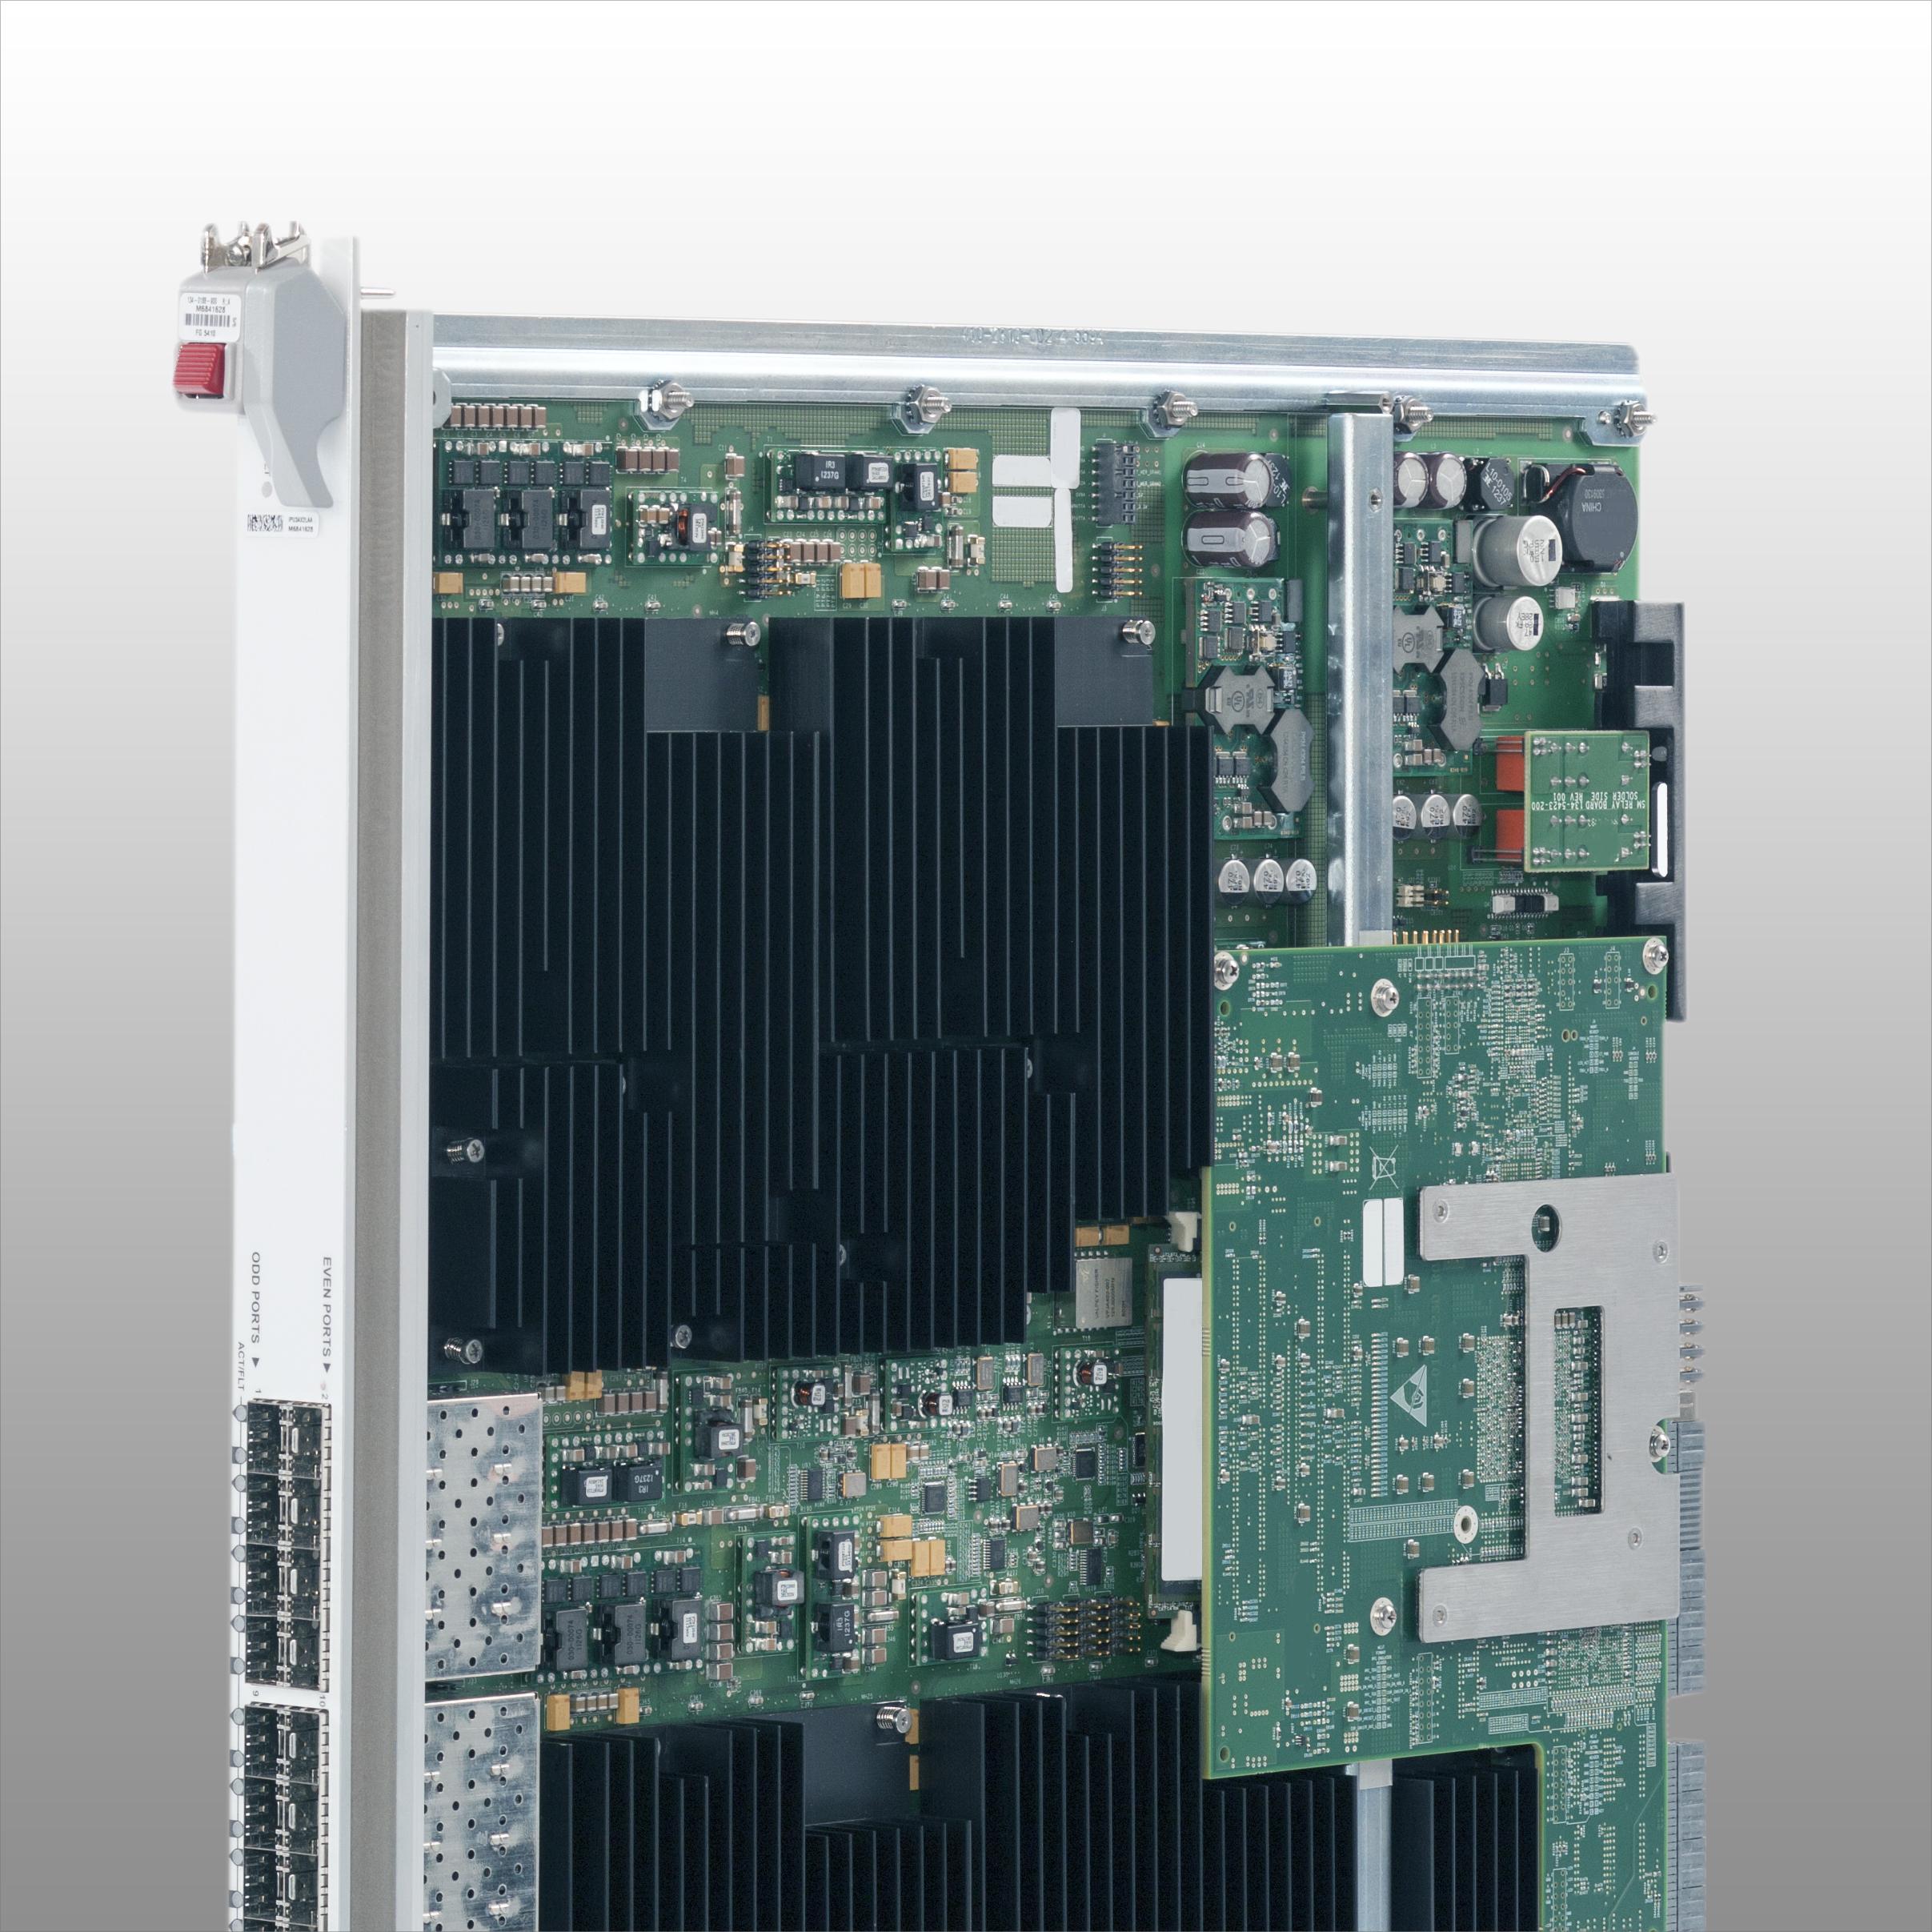 Costamesa California Sanmina American Orders Of Rigid Printed Circuit Boards And Flexible Circuits Pcba Smt